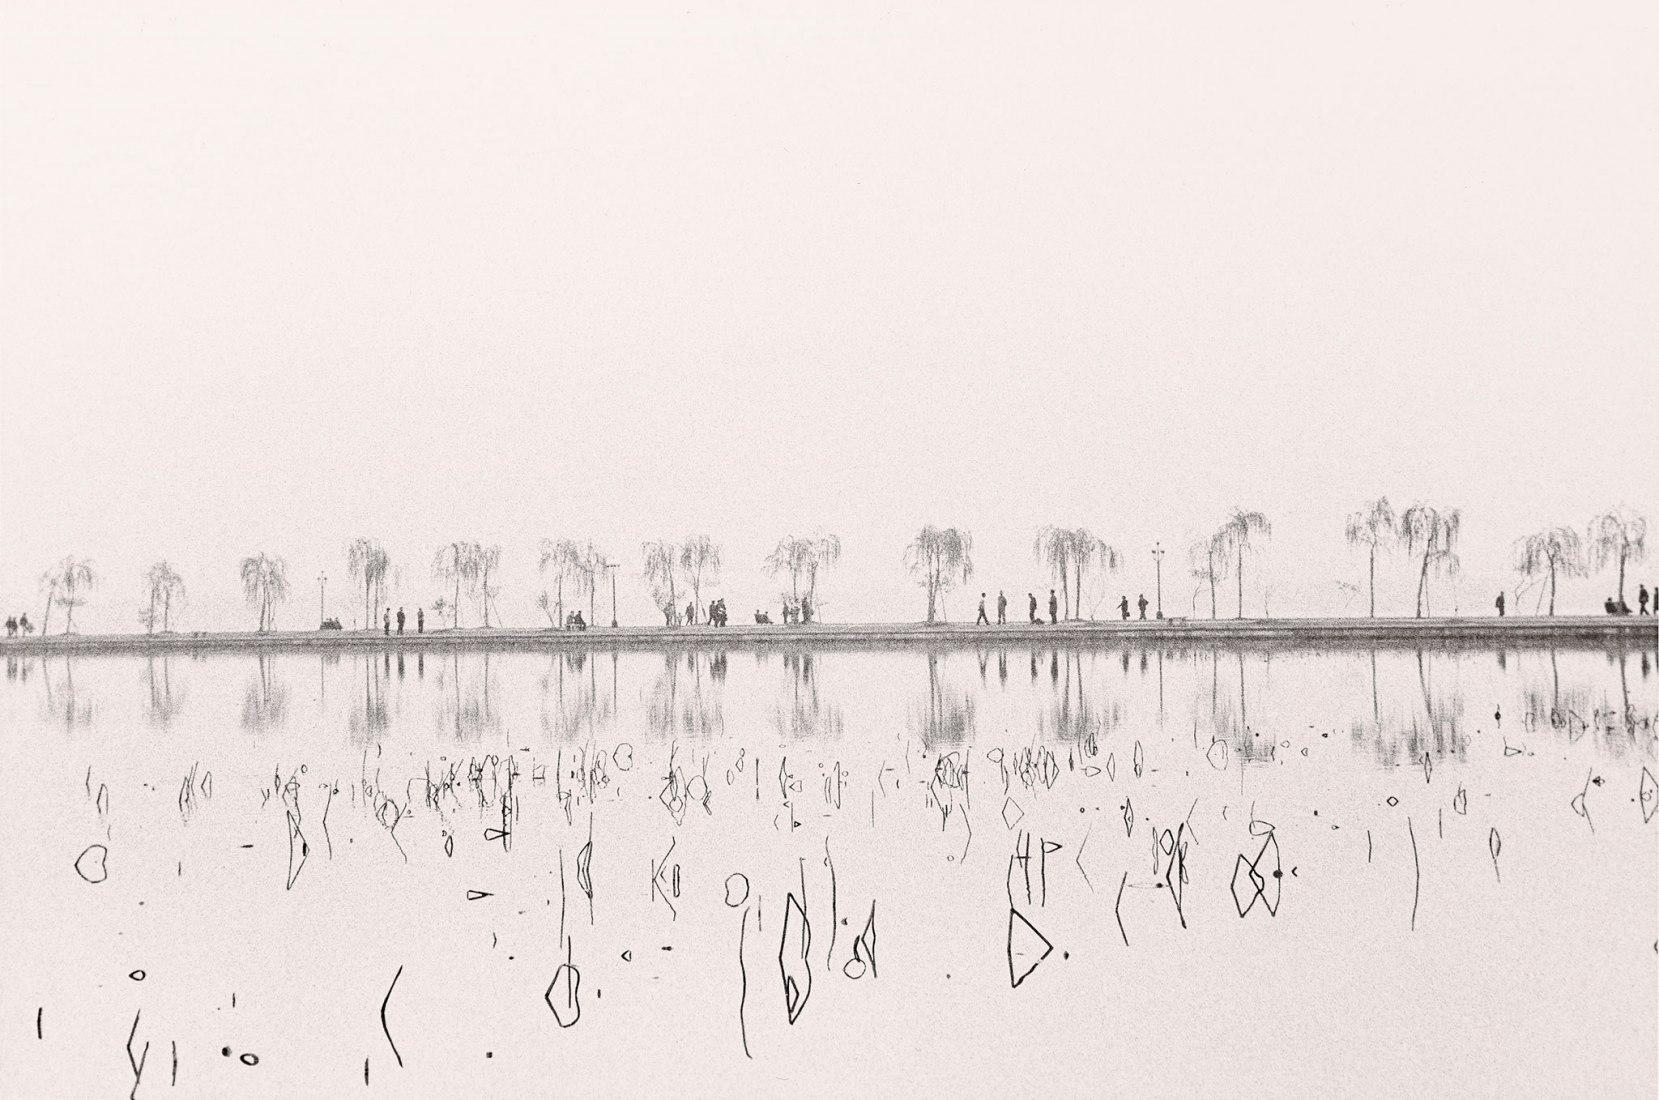 Lago de Hangzhou, 1979 by Manel Armengol. Image courtesy of Fundación Foto Colectania